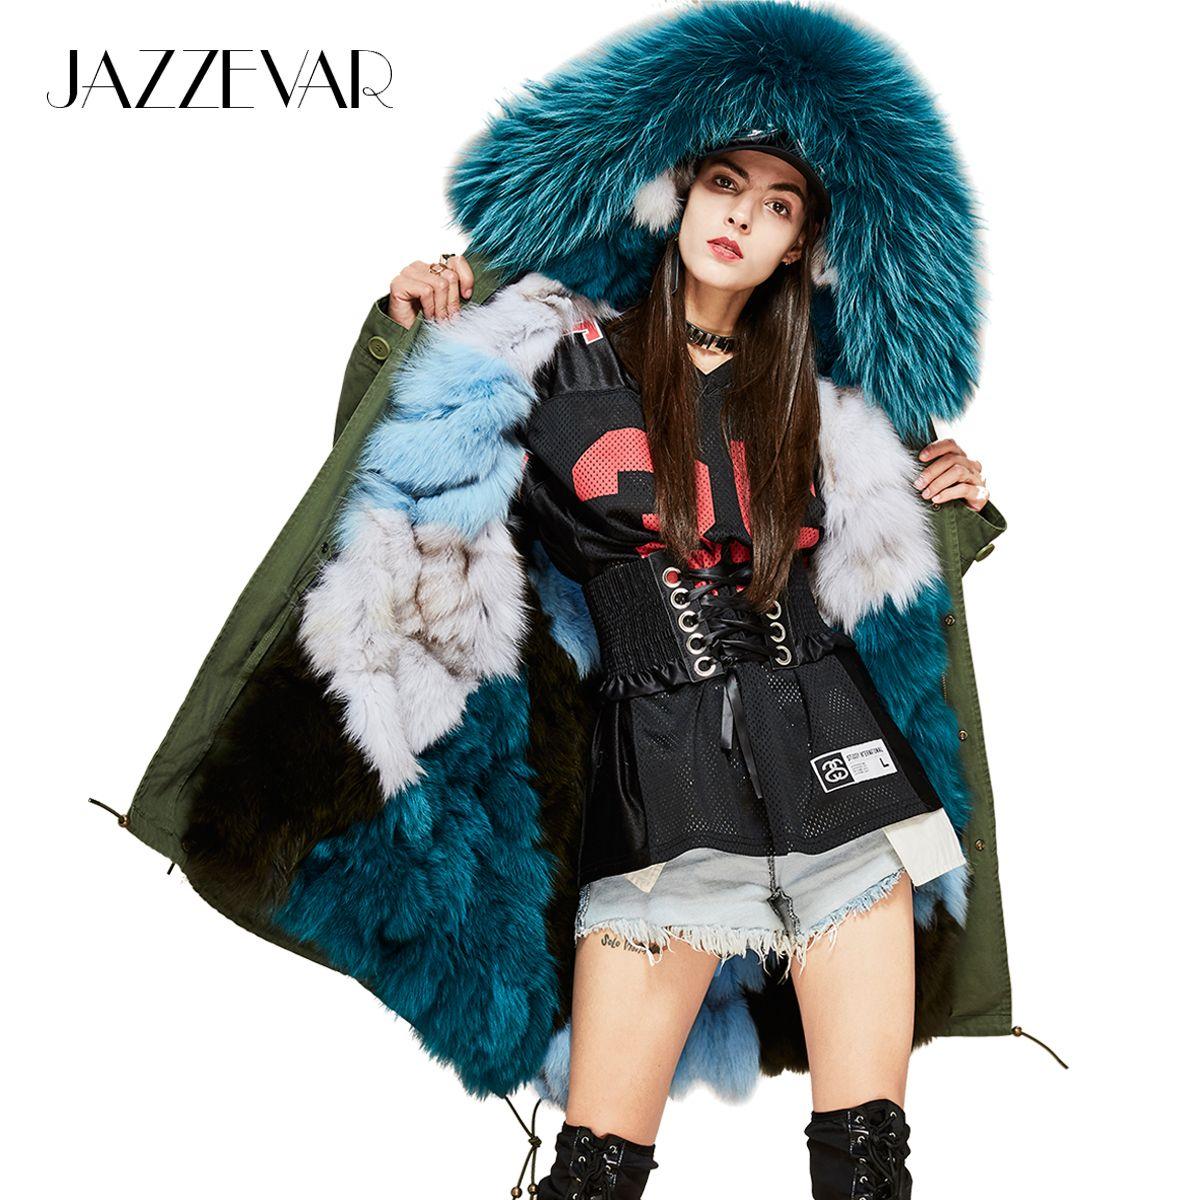 JAZZEVAR Neue Mode Frau Luxuriöse Echt Fuchs pelz futter Military Parka MIDI Große Waschbär pelz Mit Kapuze Mantel Outwear Winter Jacke